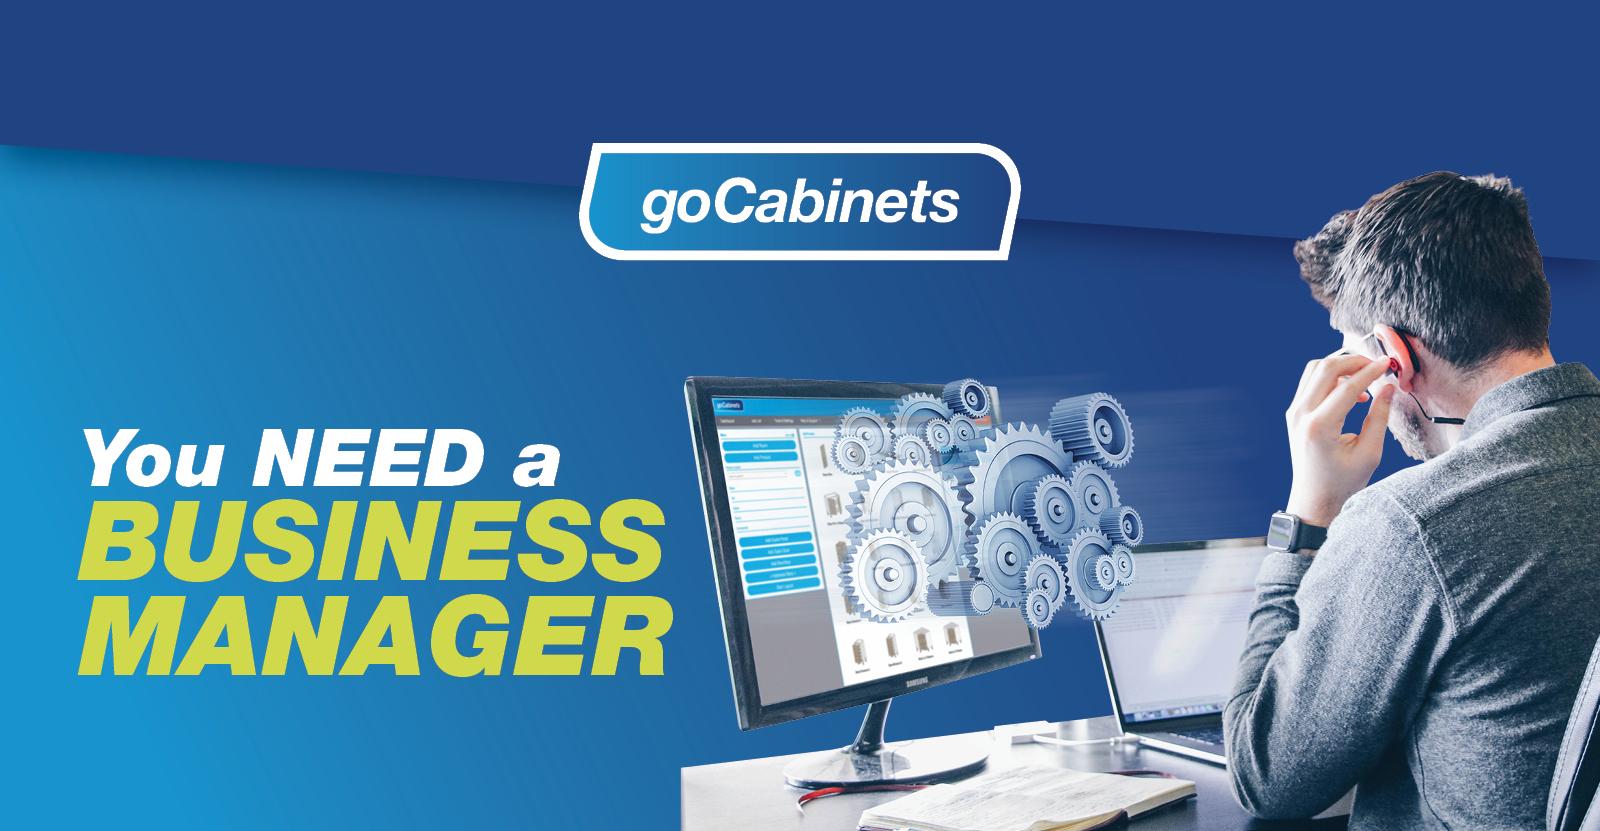 goCabinets logo, man at desktop with text